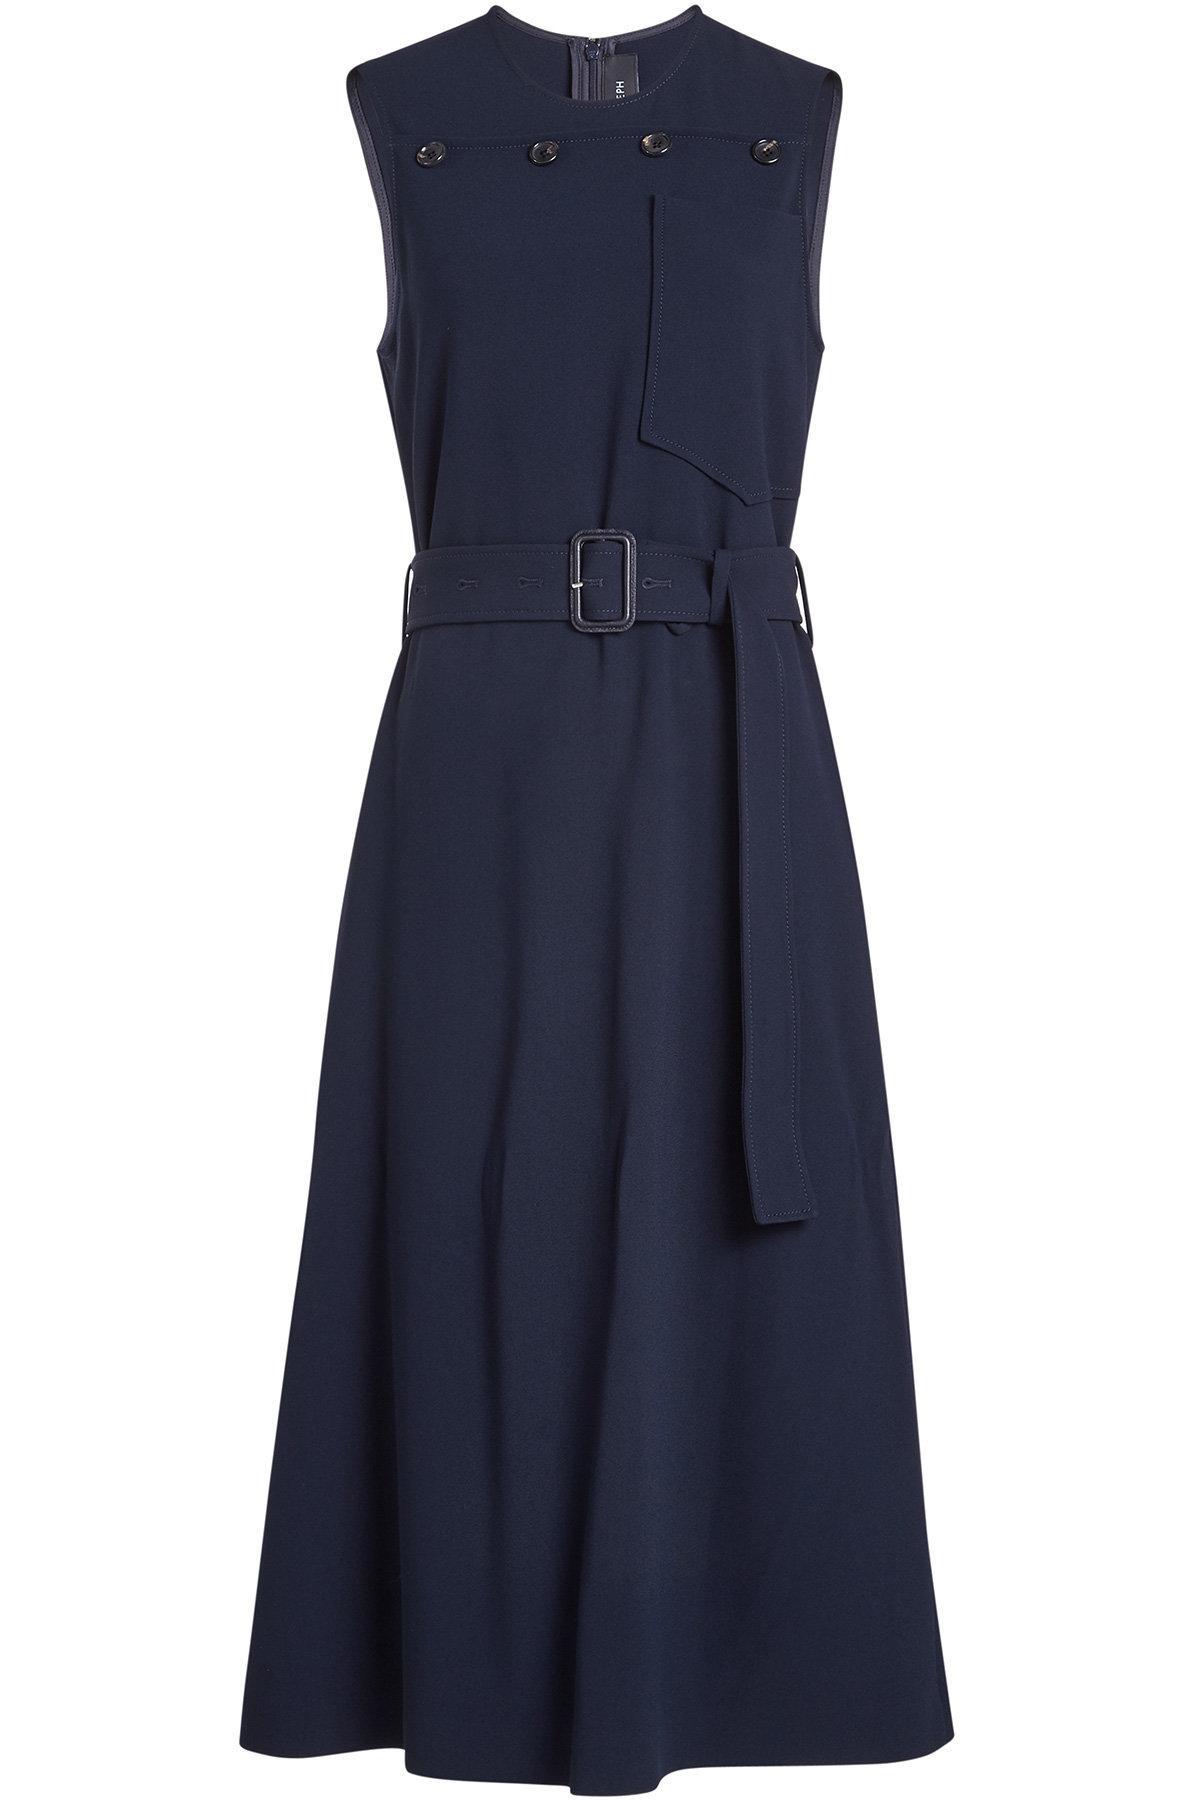 Joseph Dress With Belt In Blue